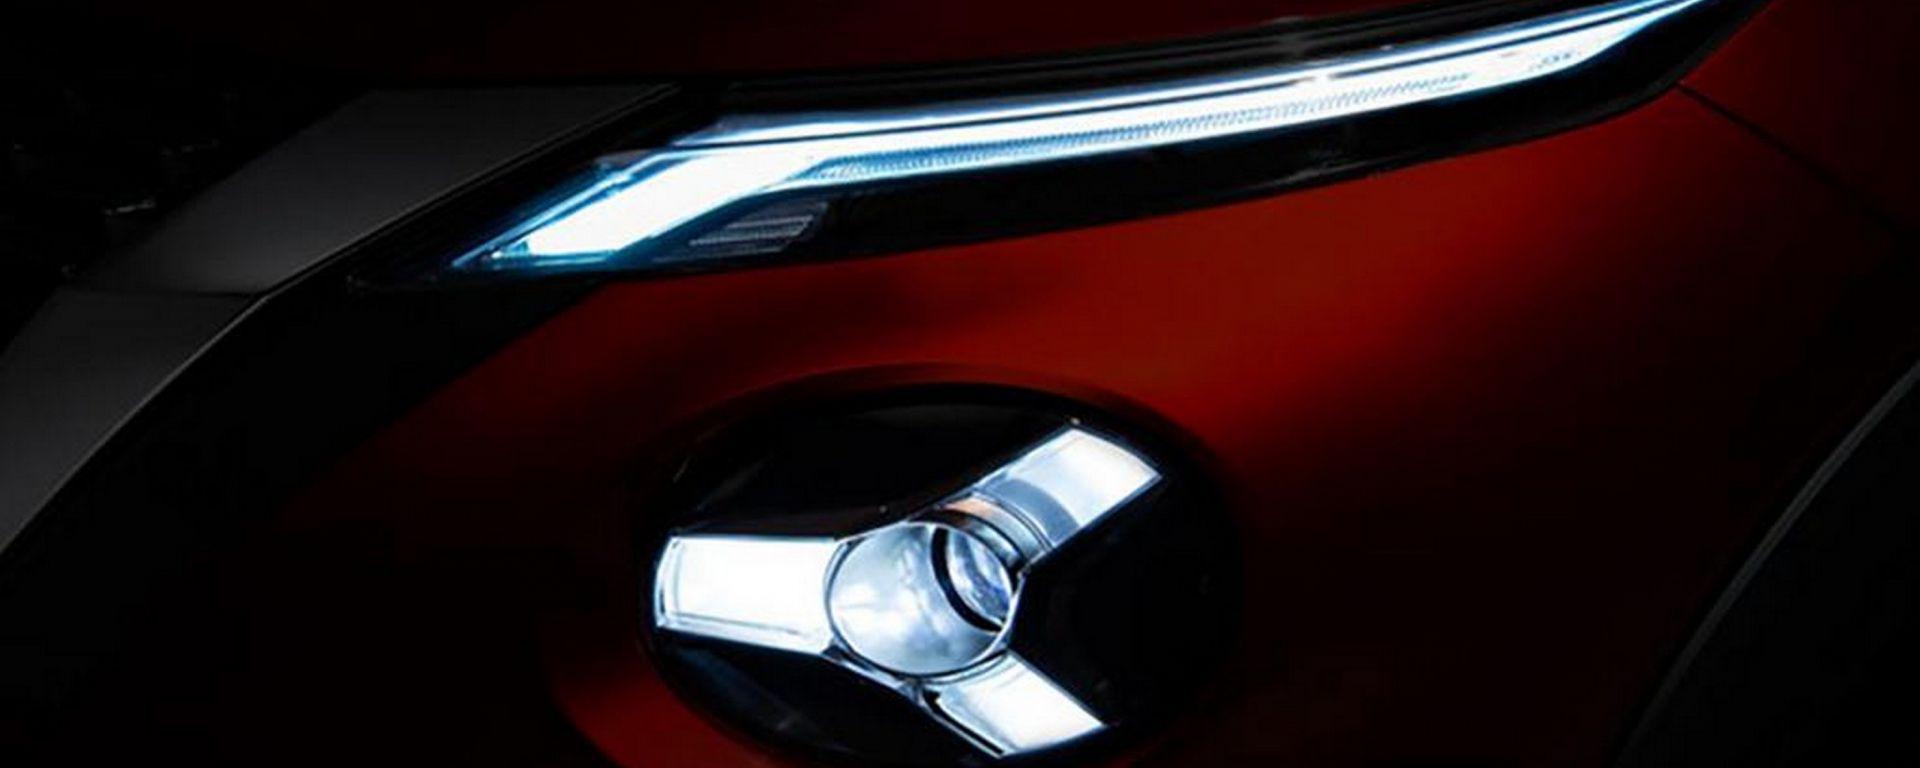 Nissan Juke 2020, primo teaser